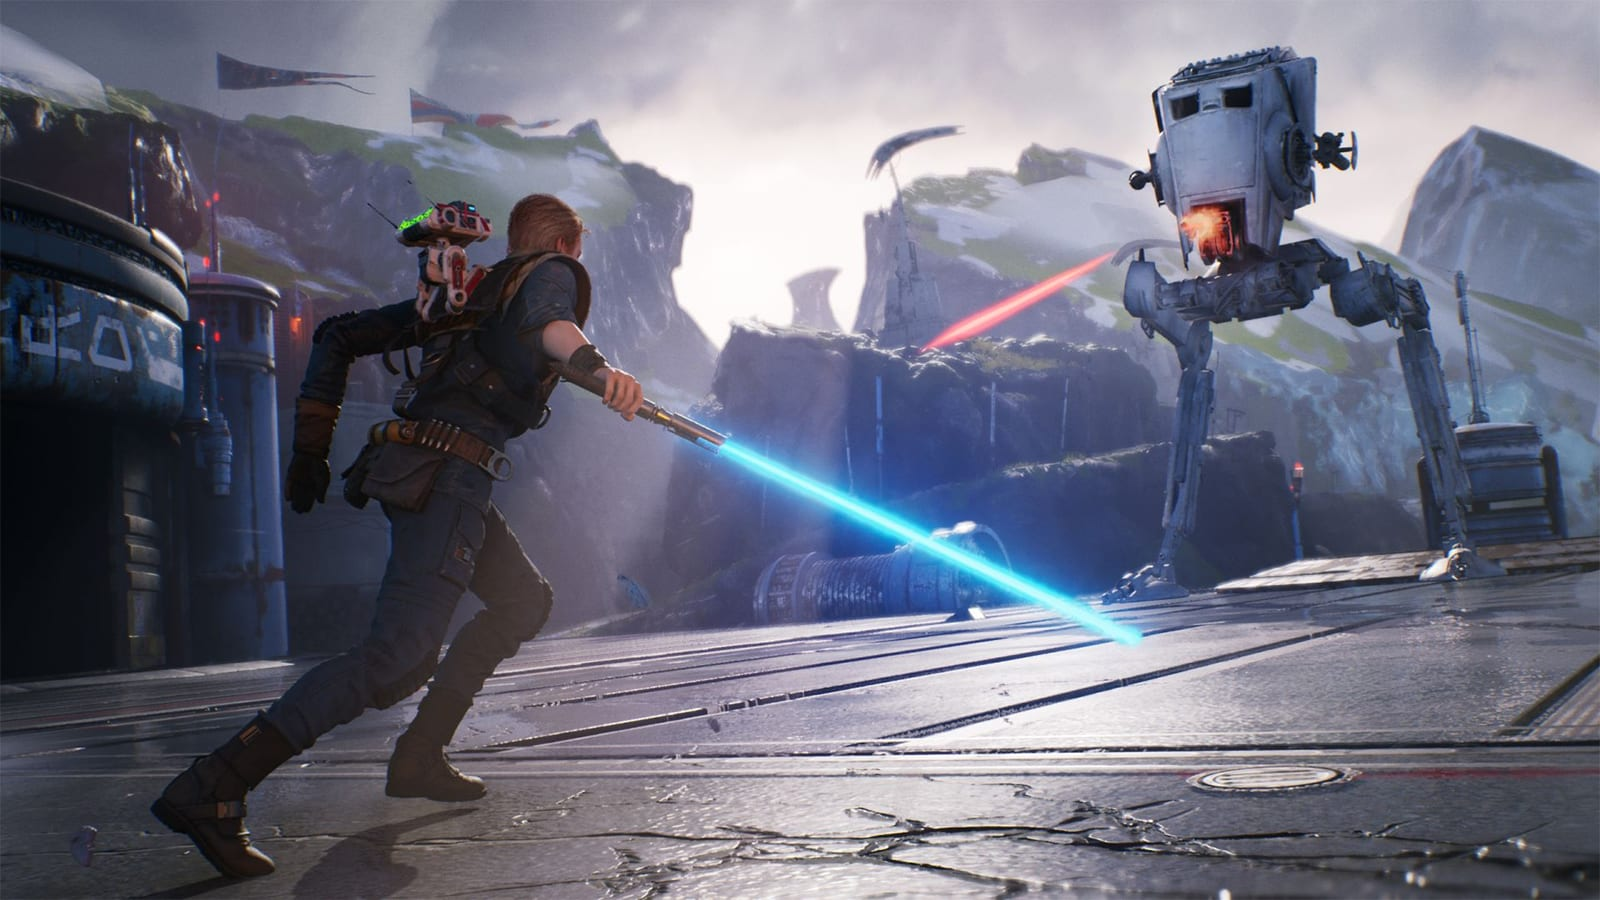 Nintendo Switch Star Wars Jedi: Fallen Order